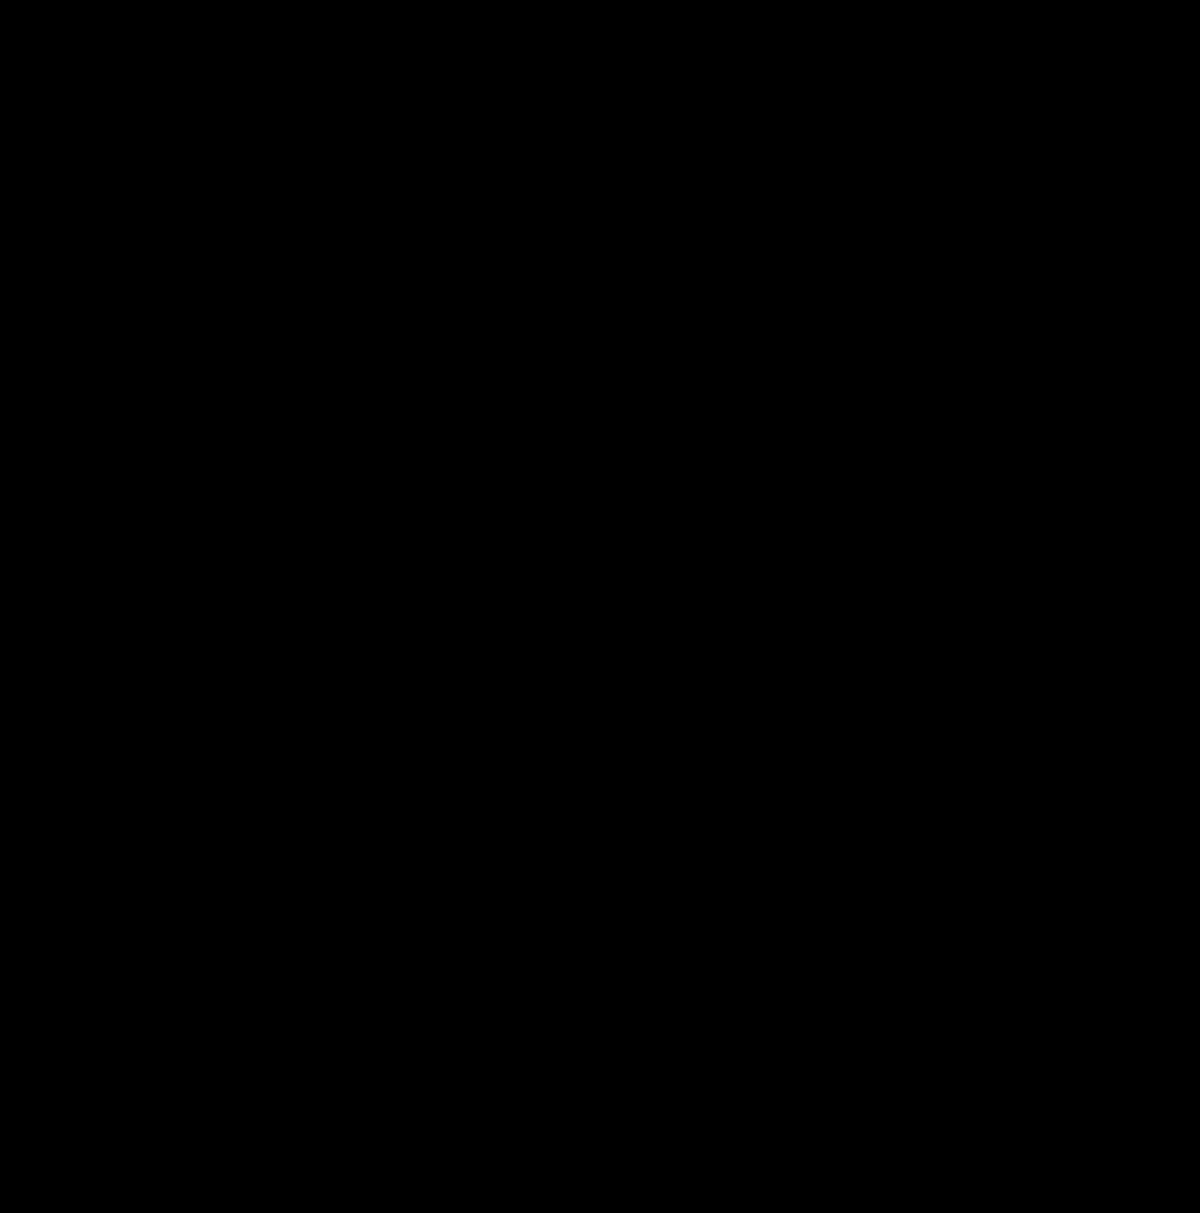 Mediakita - Wikipedia bahasa Indonesia, ensiklopedia bebas